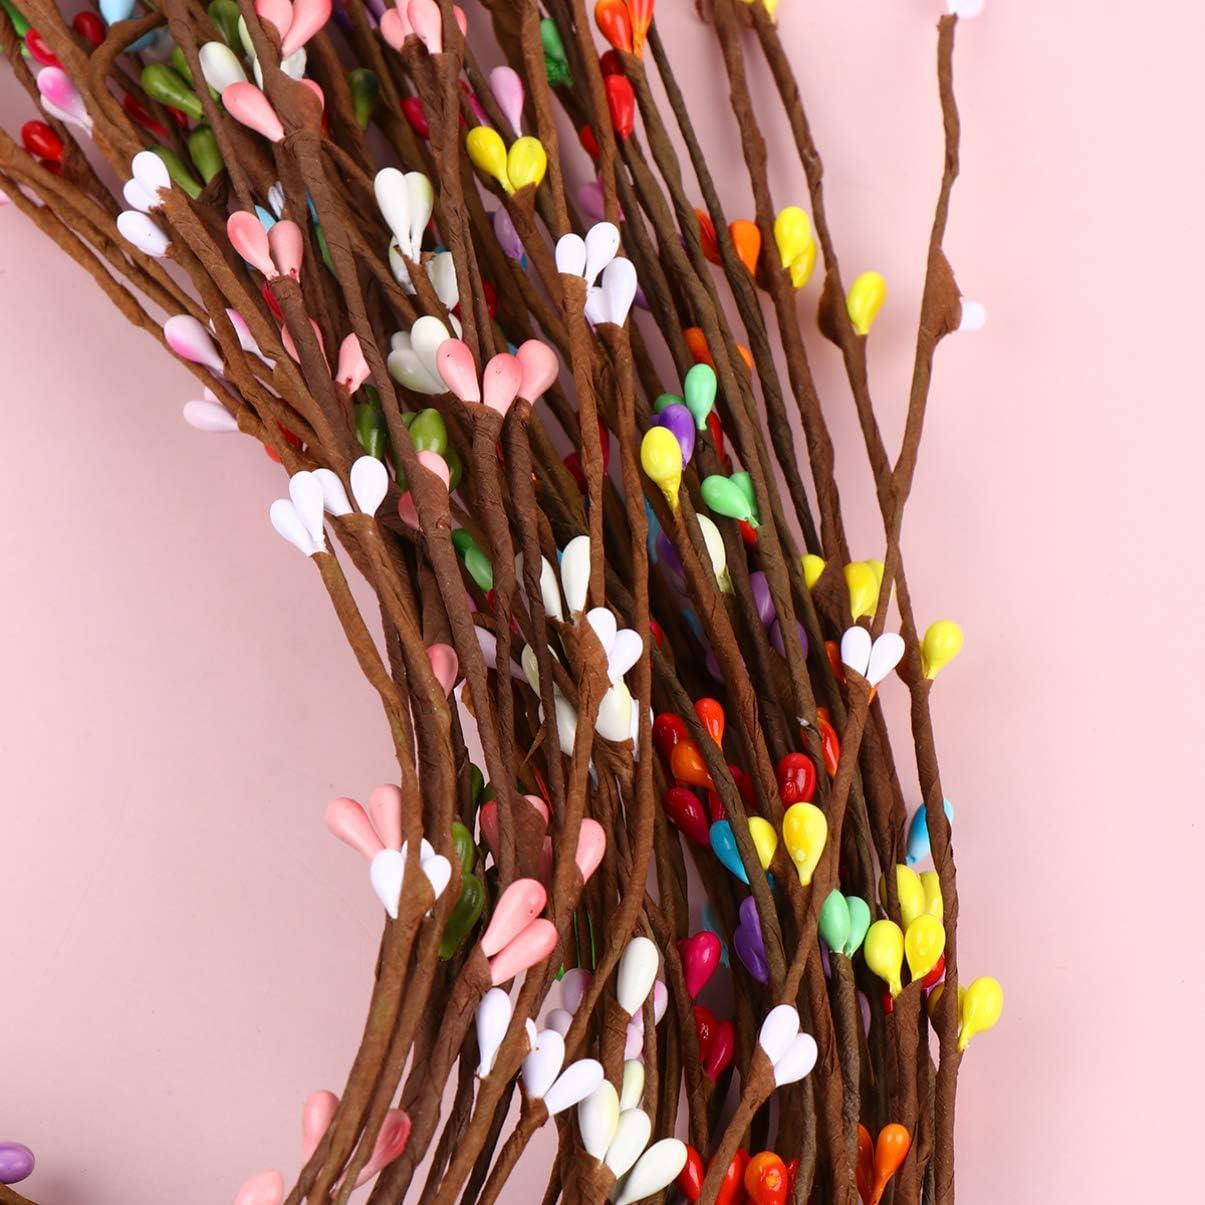 EXCEART Artificial Pip Berries Wreath Making Berry Picks Decorative Berry Rattan Strings DIY Fake Berries 50pcs Assorted Color